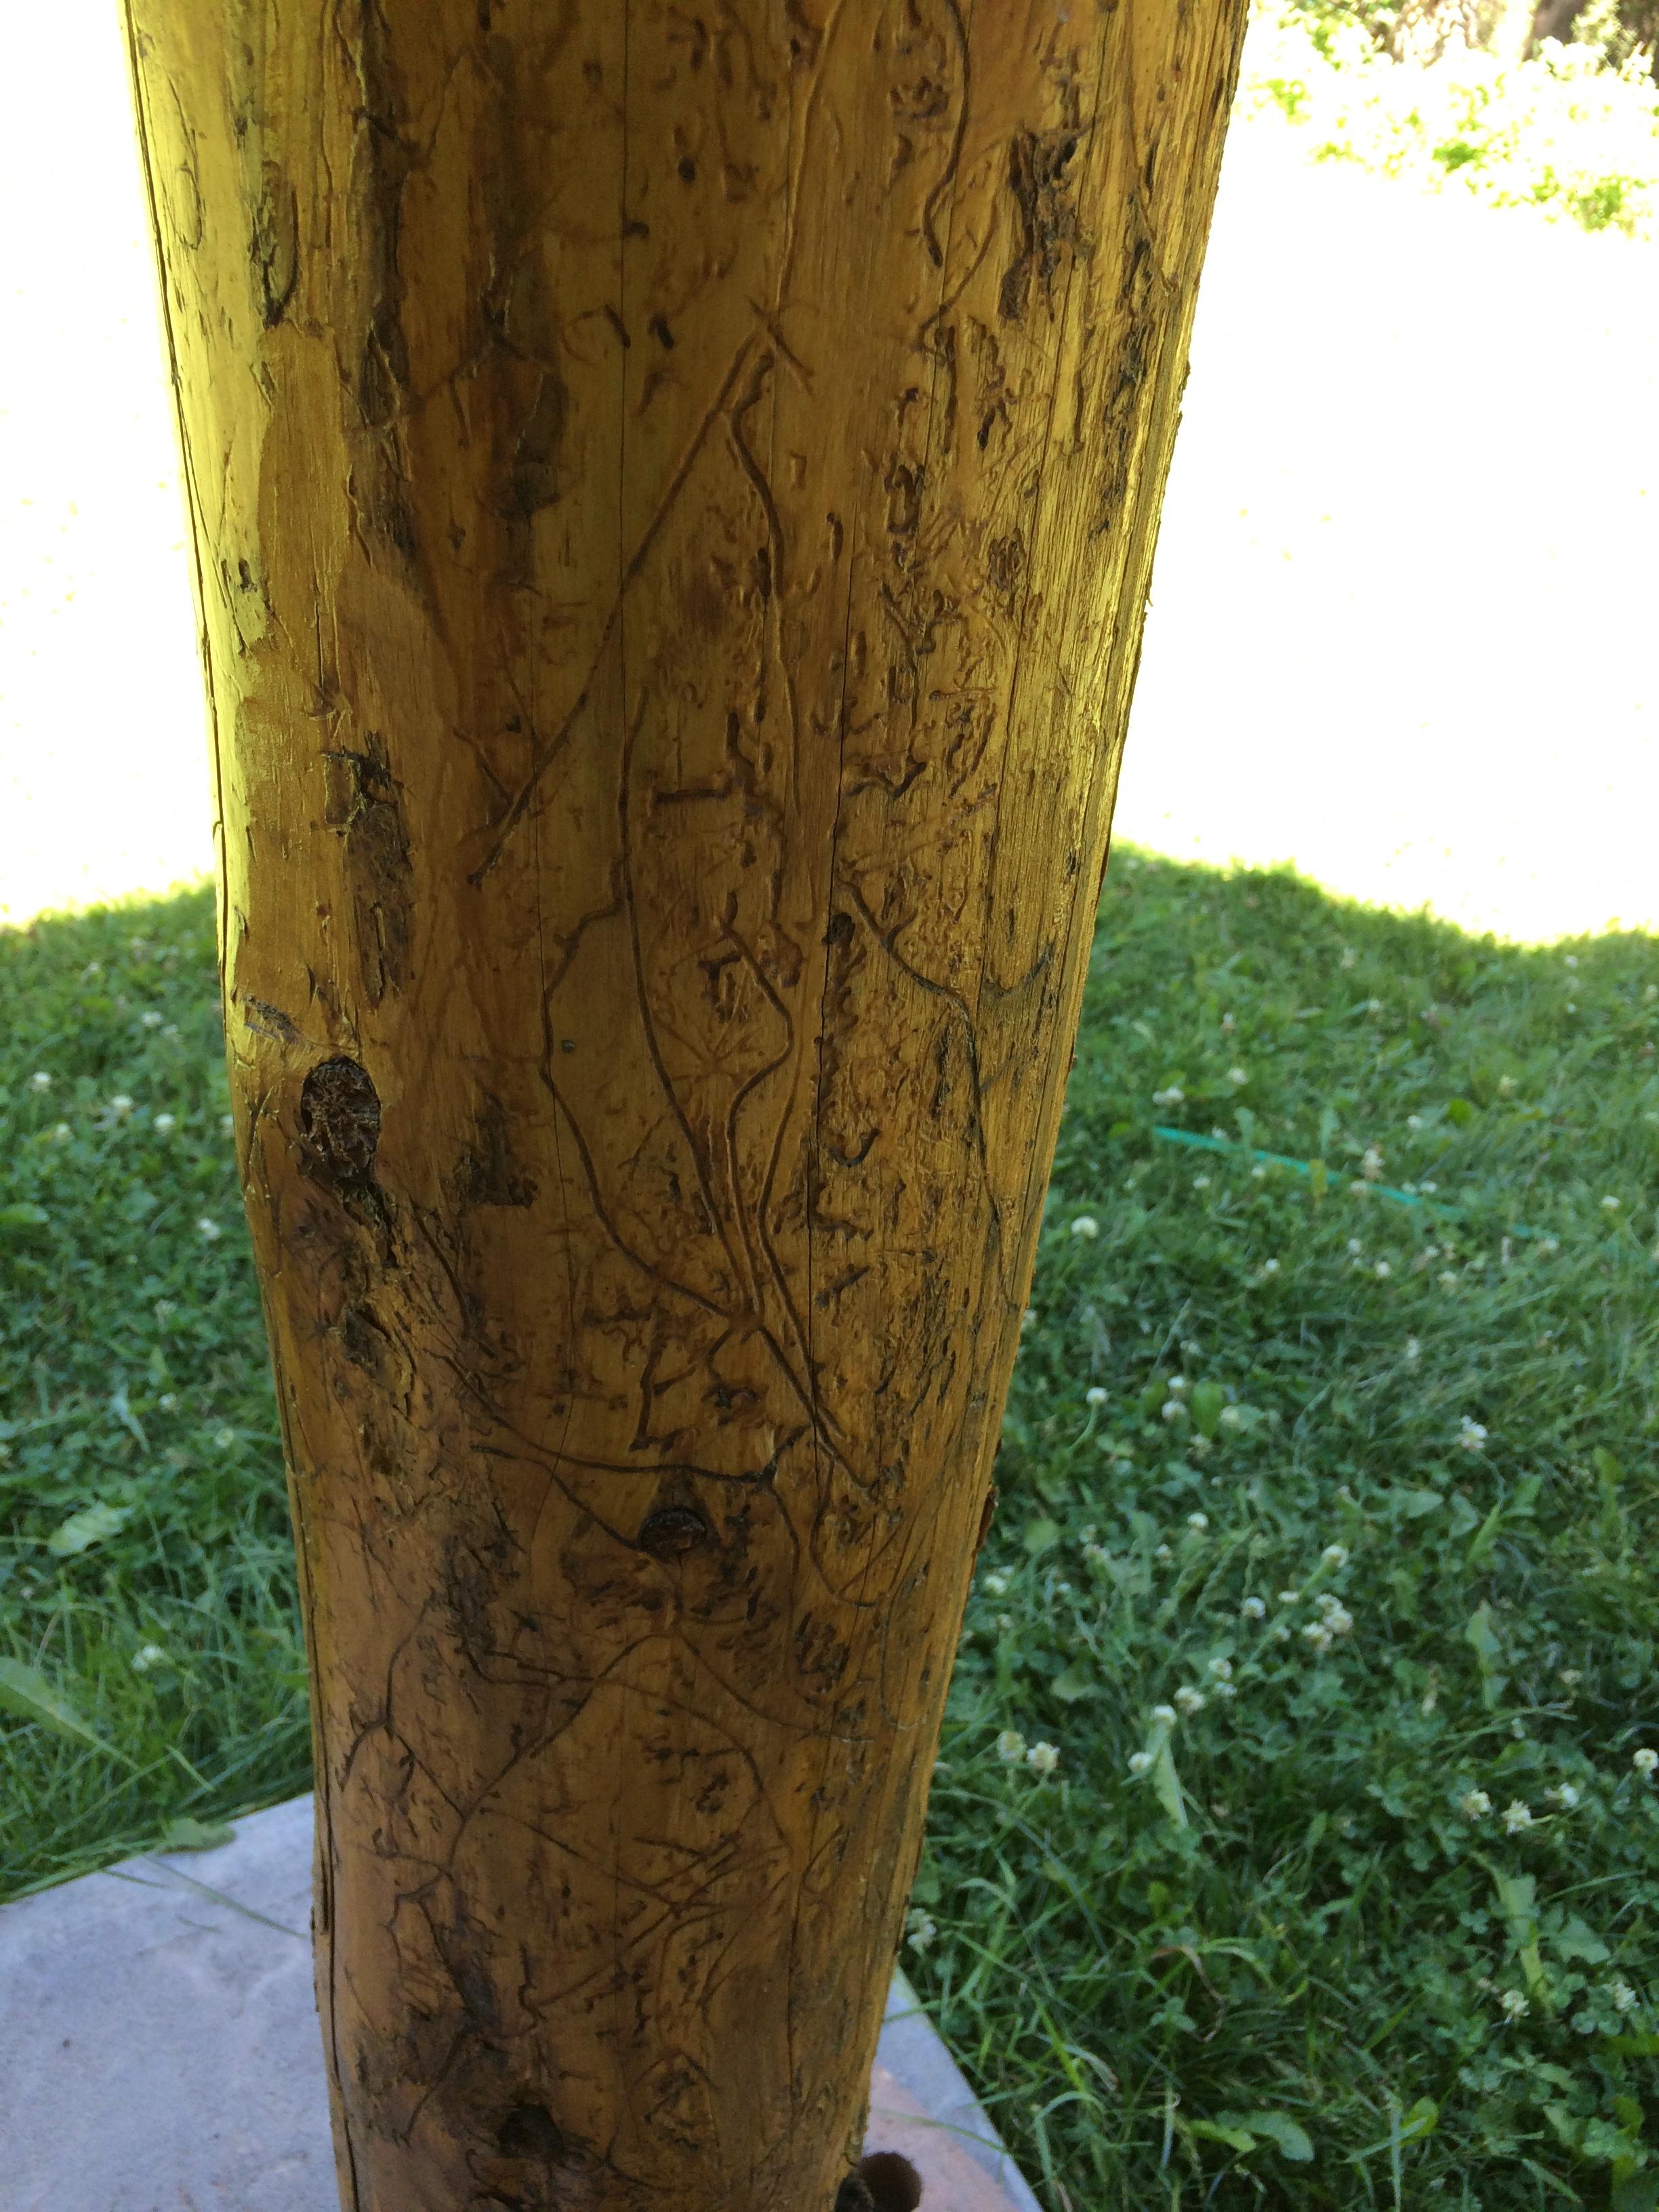 wood worm eaten wood